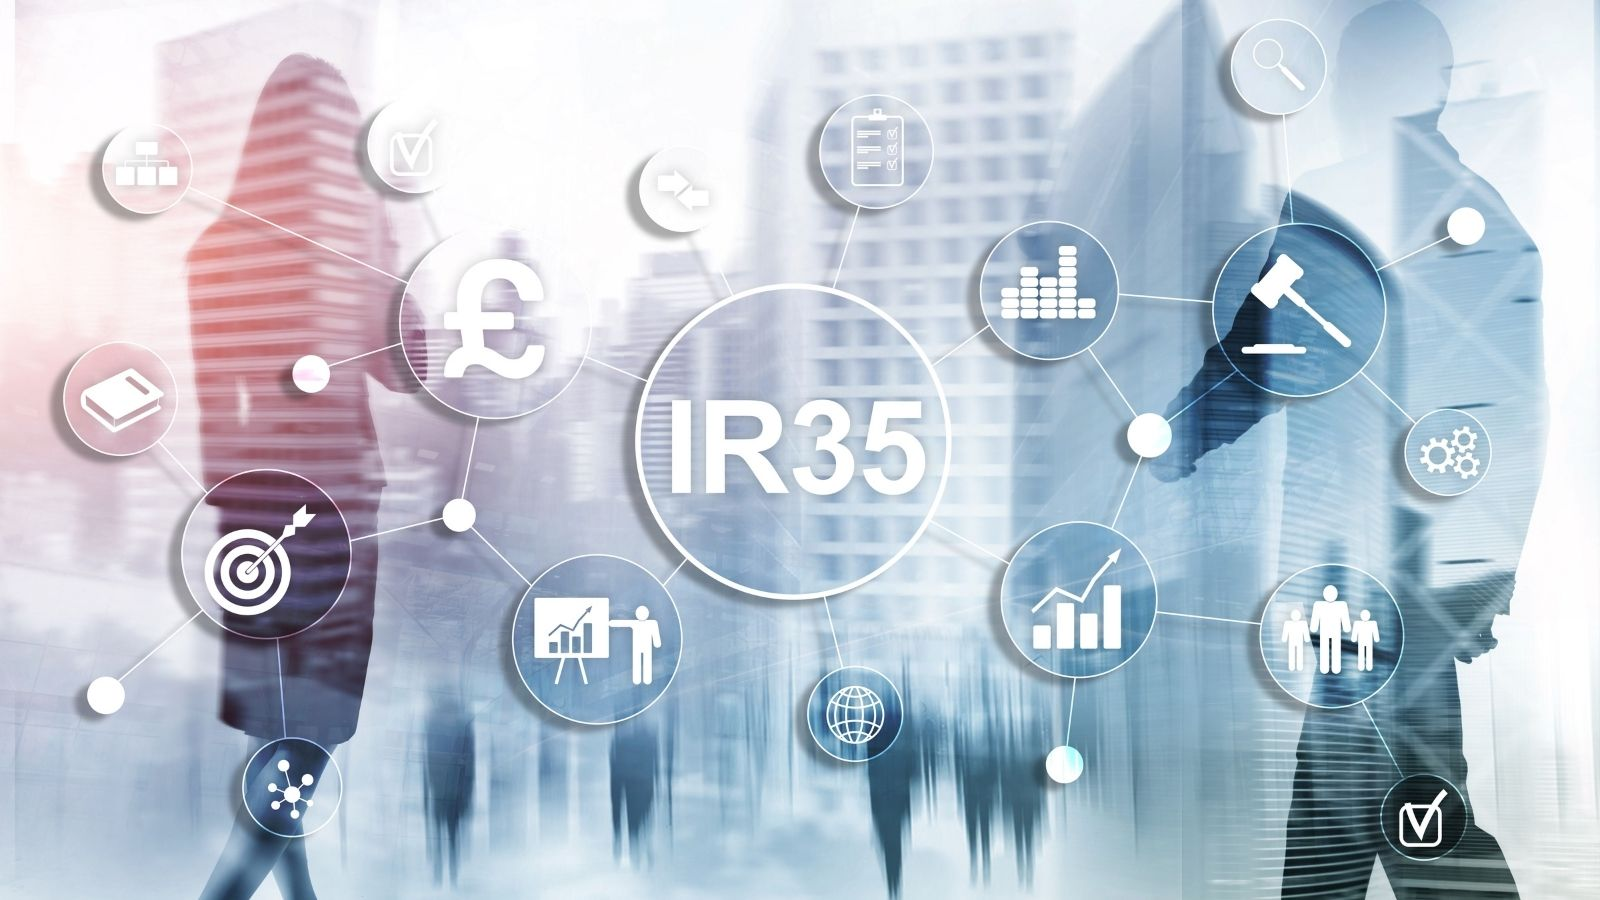 IR35 Reforms – the story so far